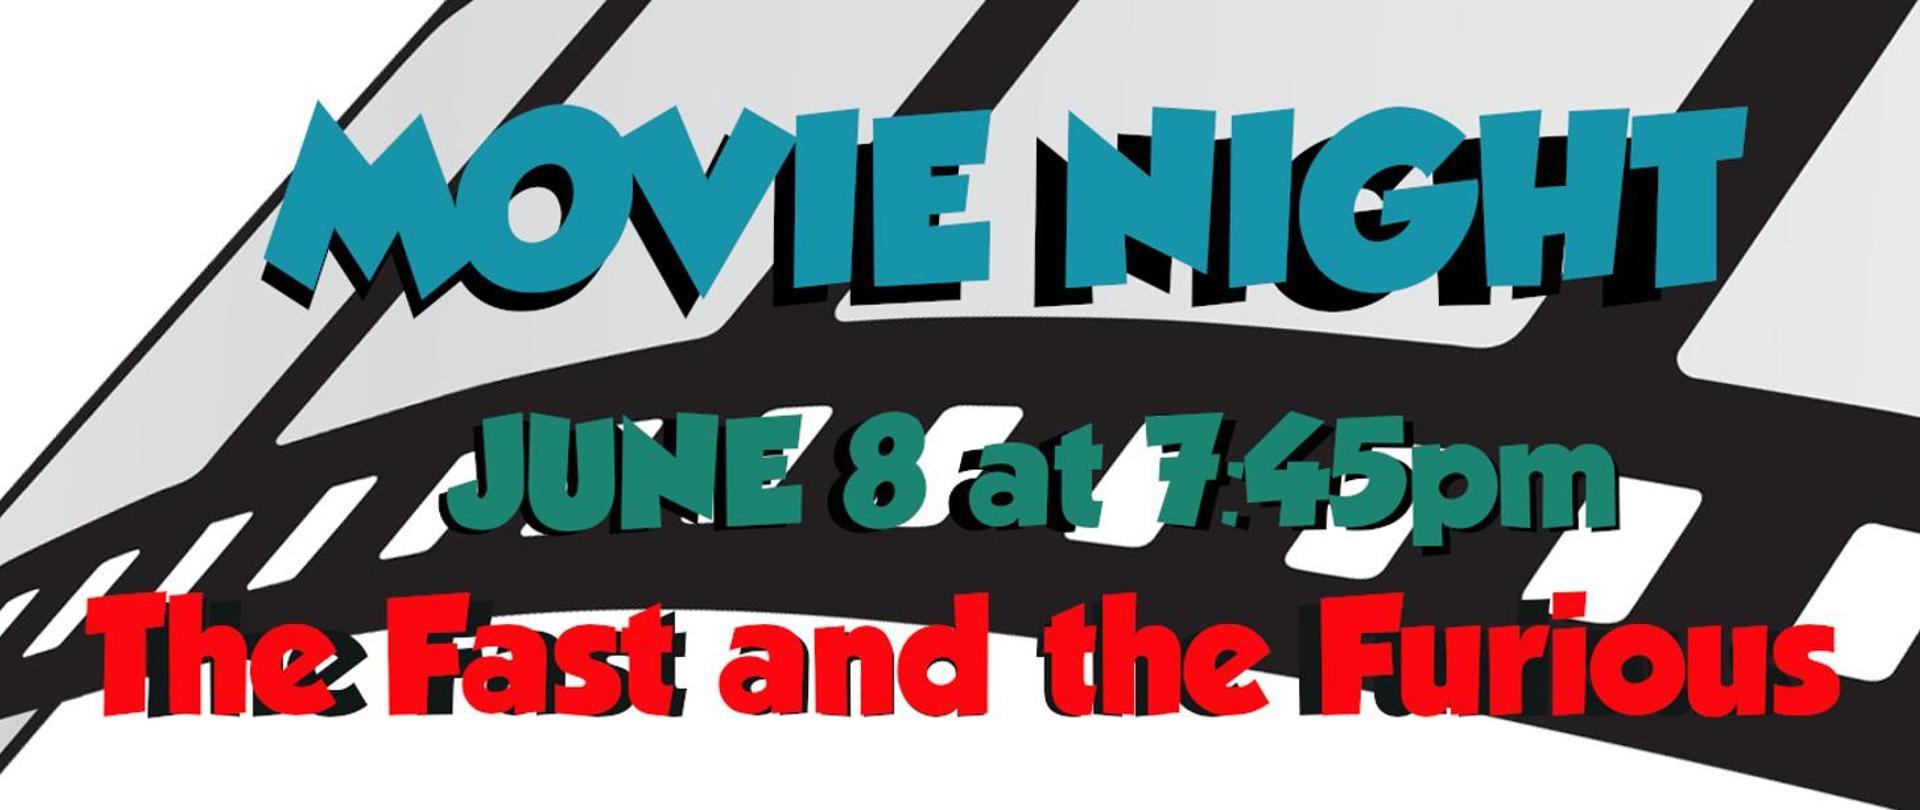 Movie night june 8 ff.png